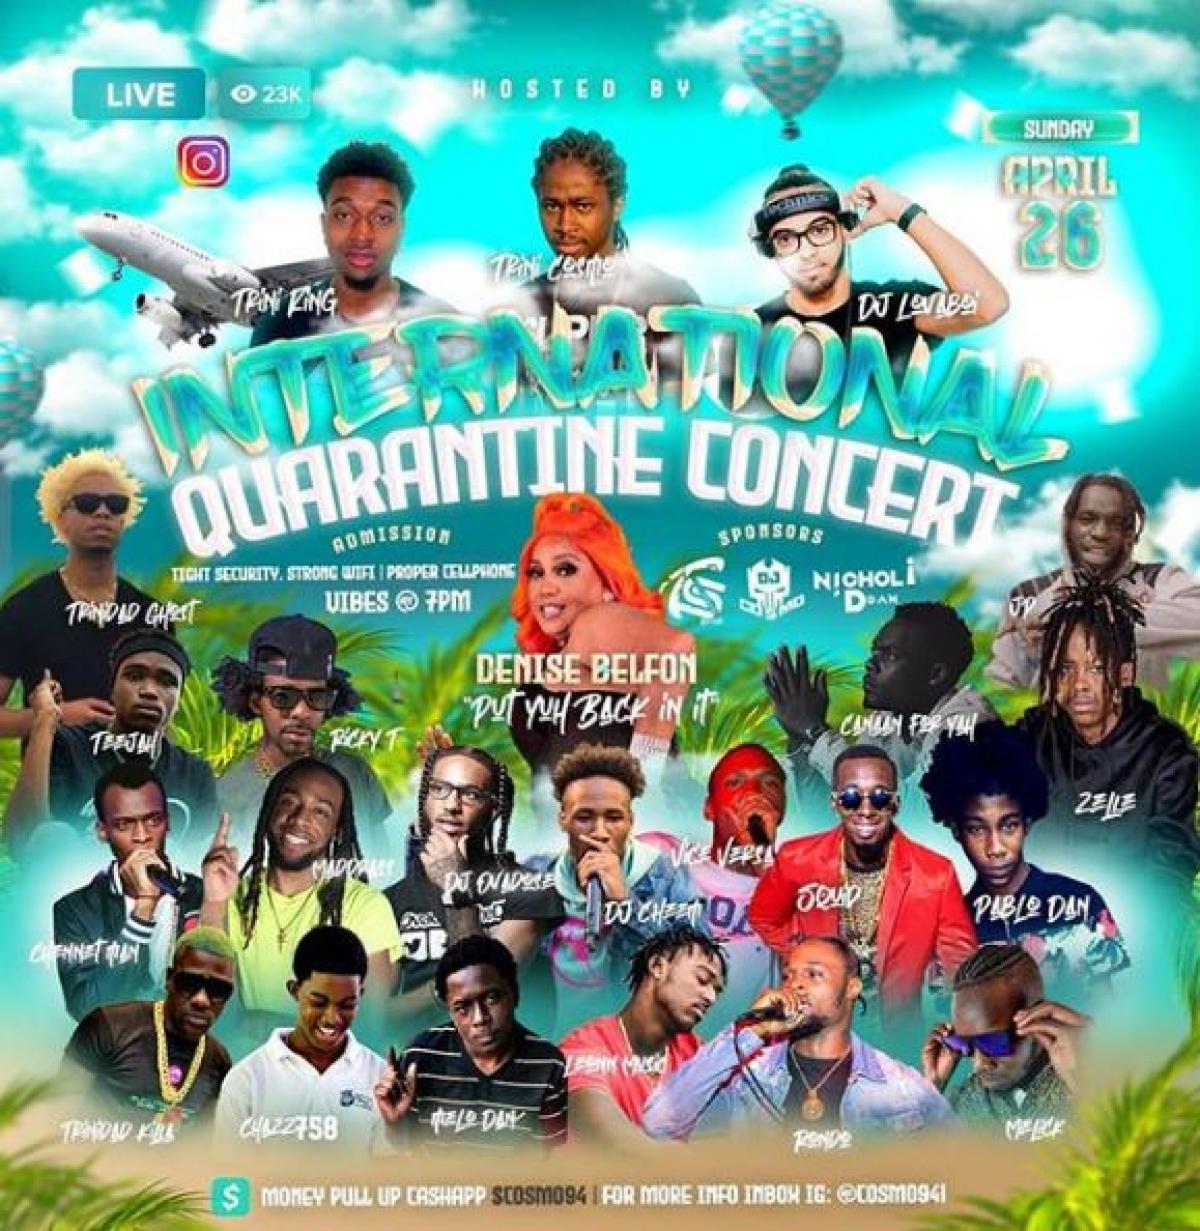 International Quaratine Concert  flyer or graphic.